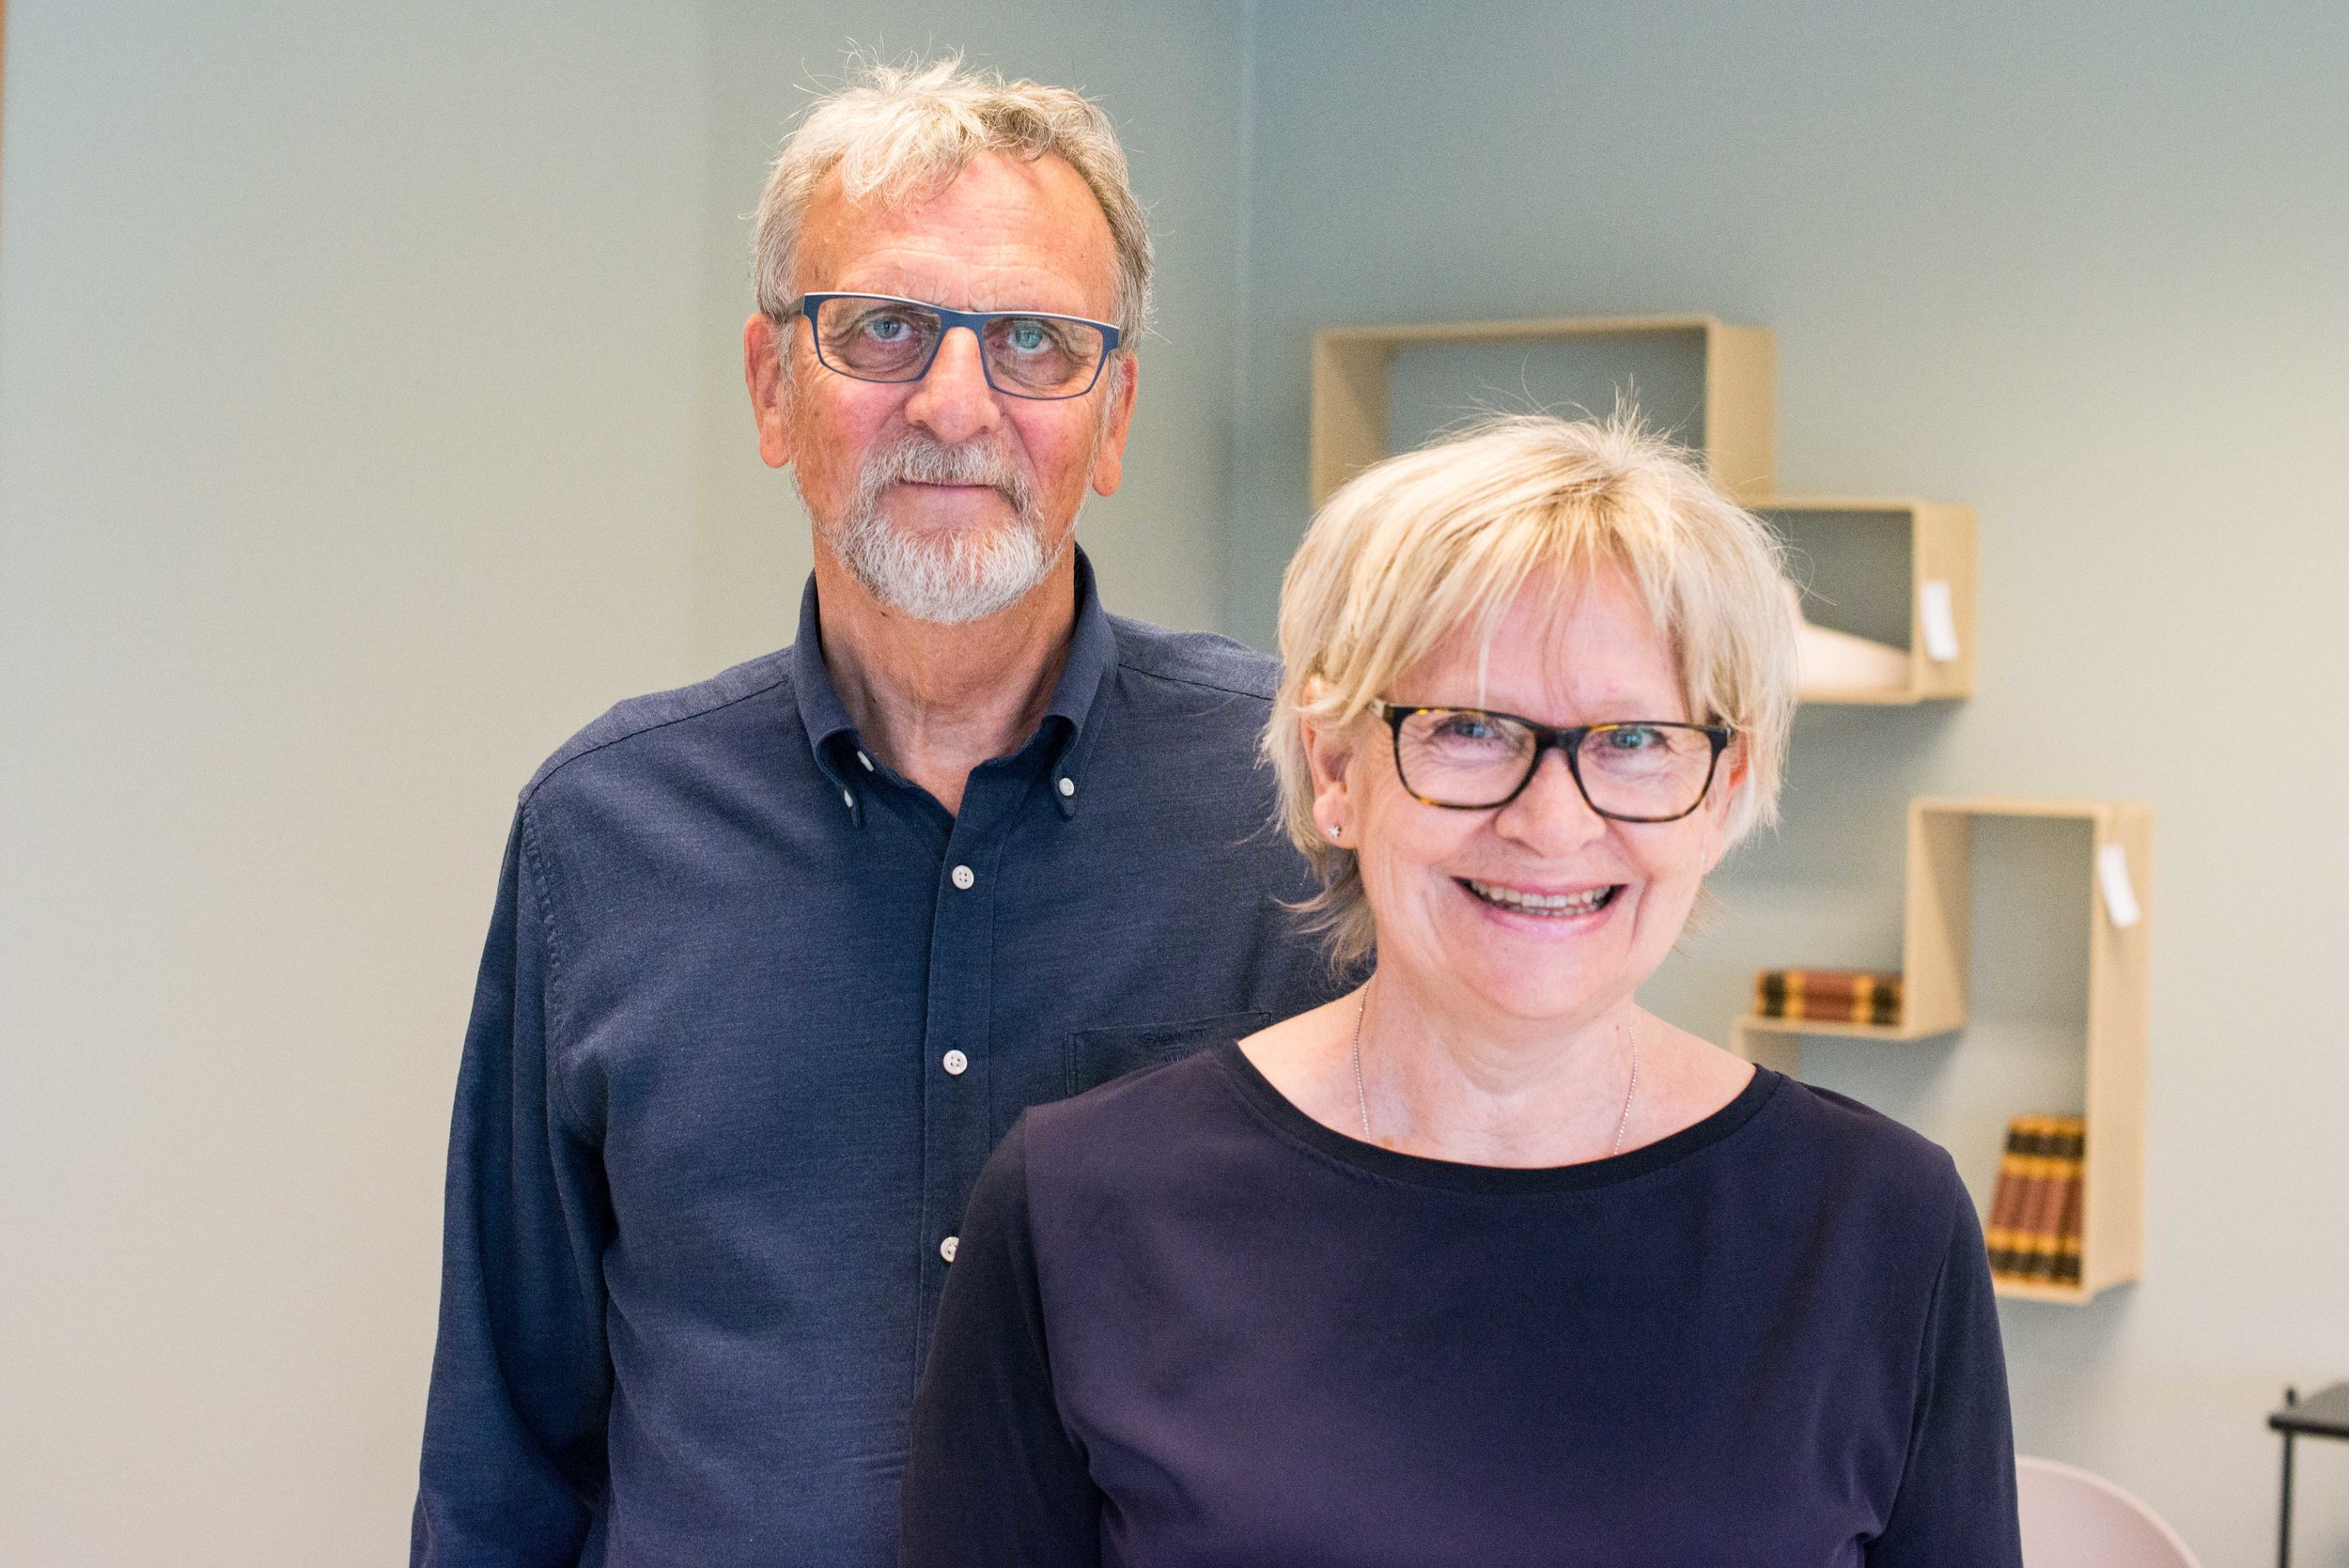 Astrid og Jarl har drevet Haukaas møbler og interiør siden 1985